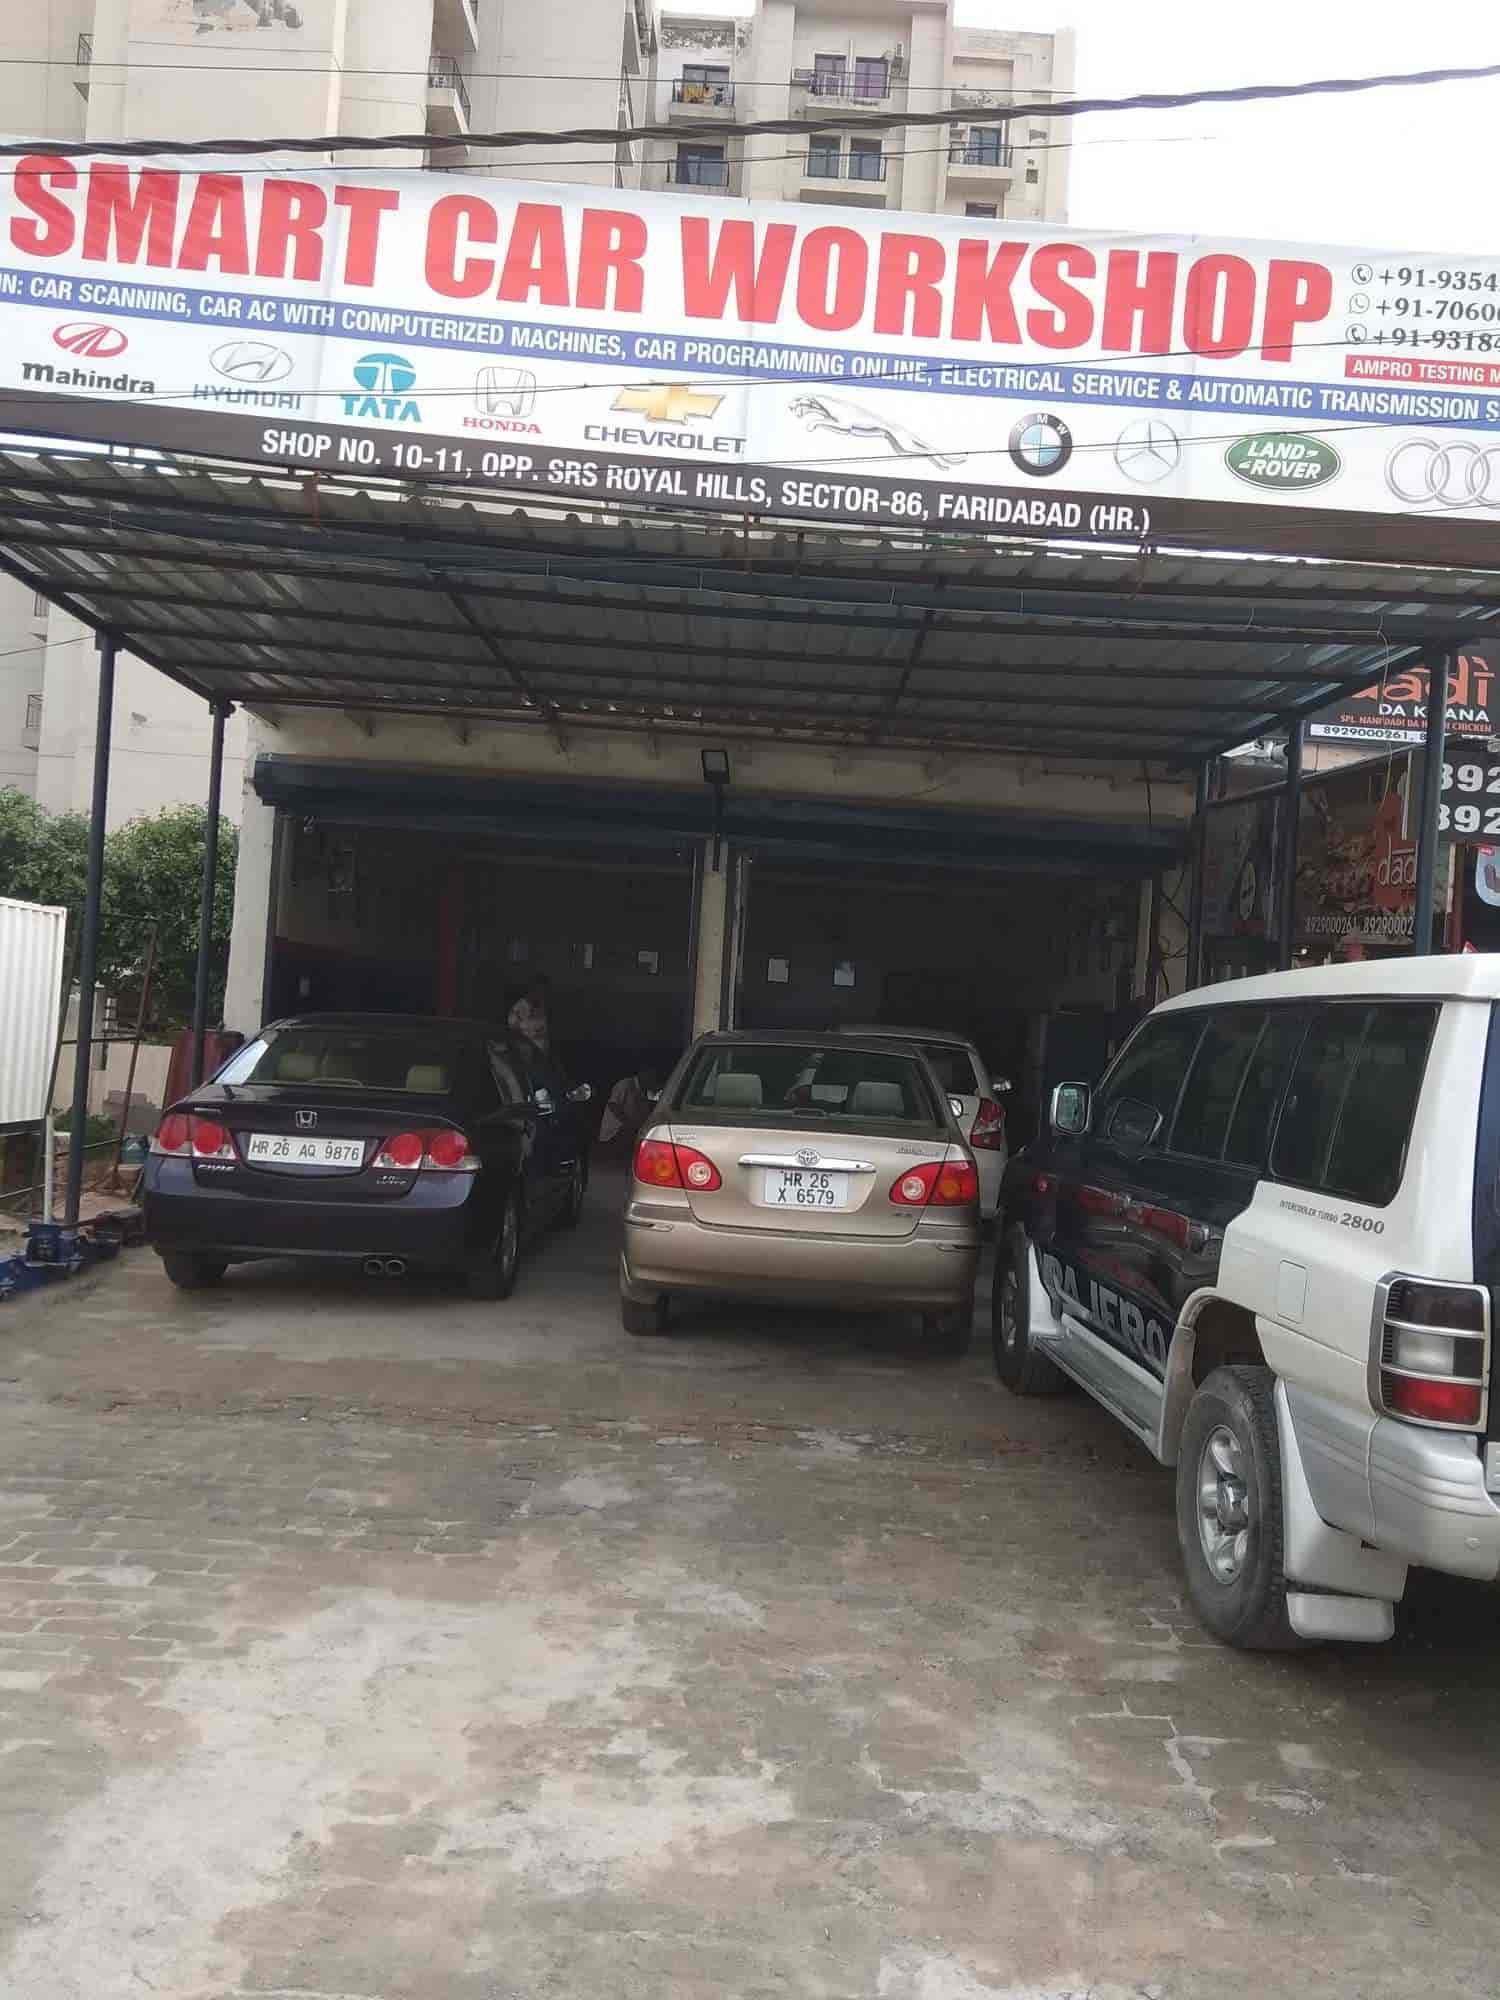 Smart Car Workshop Sector 86 Car Repair Services In Delhi